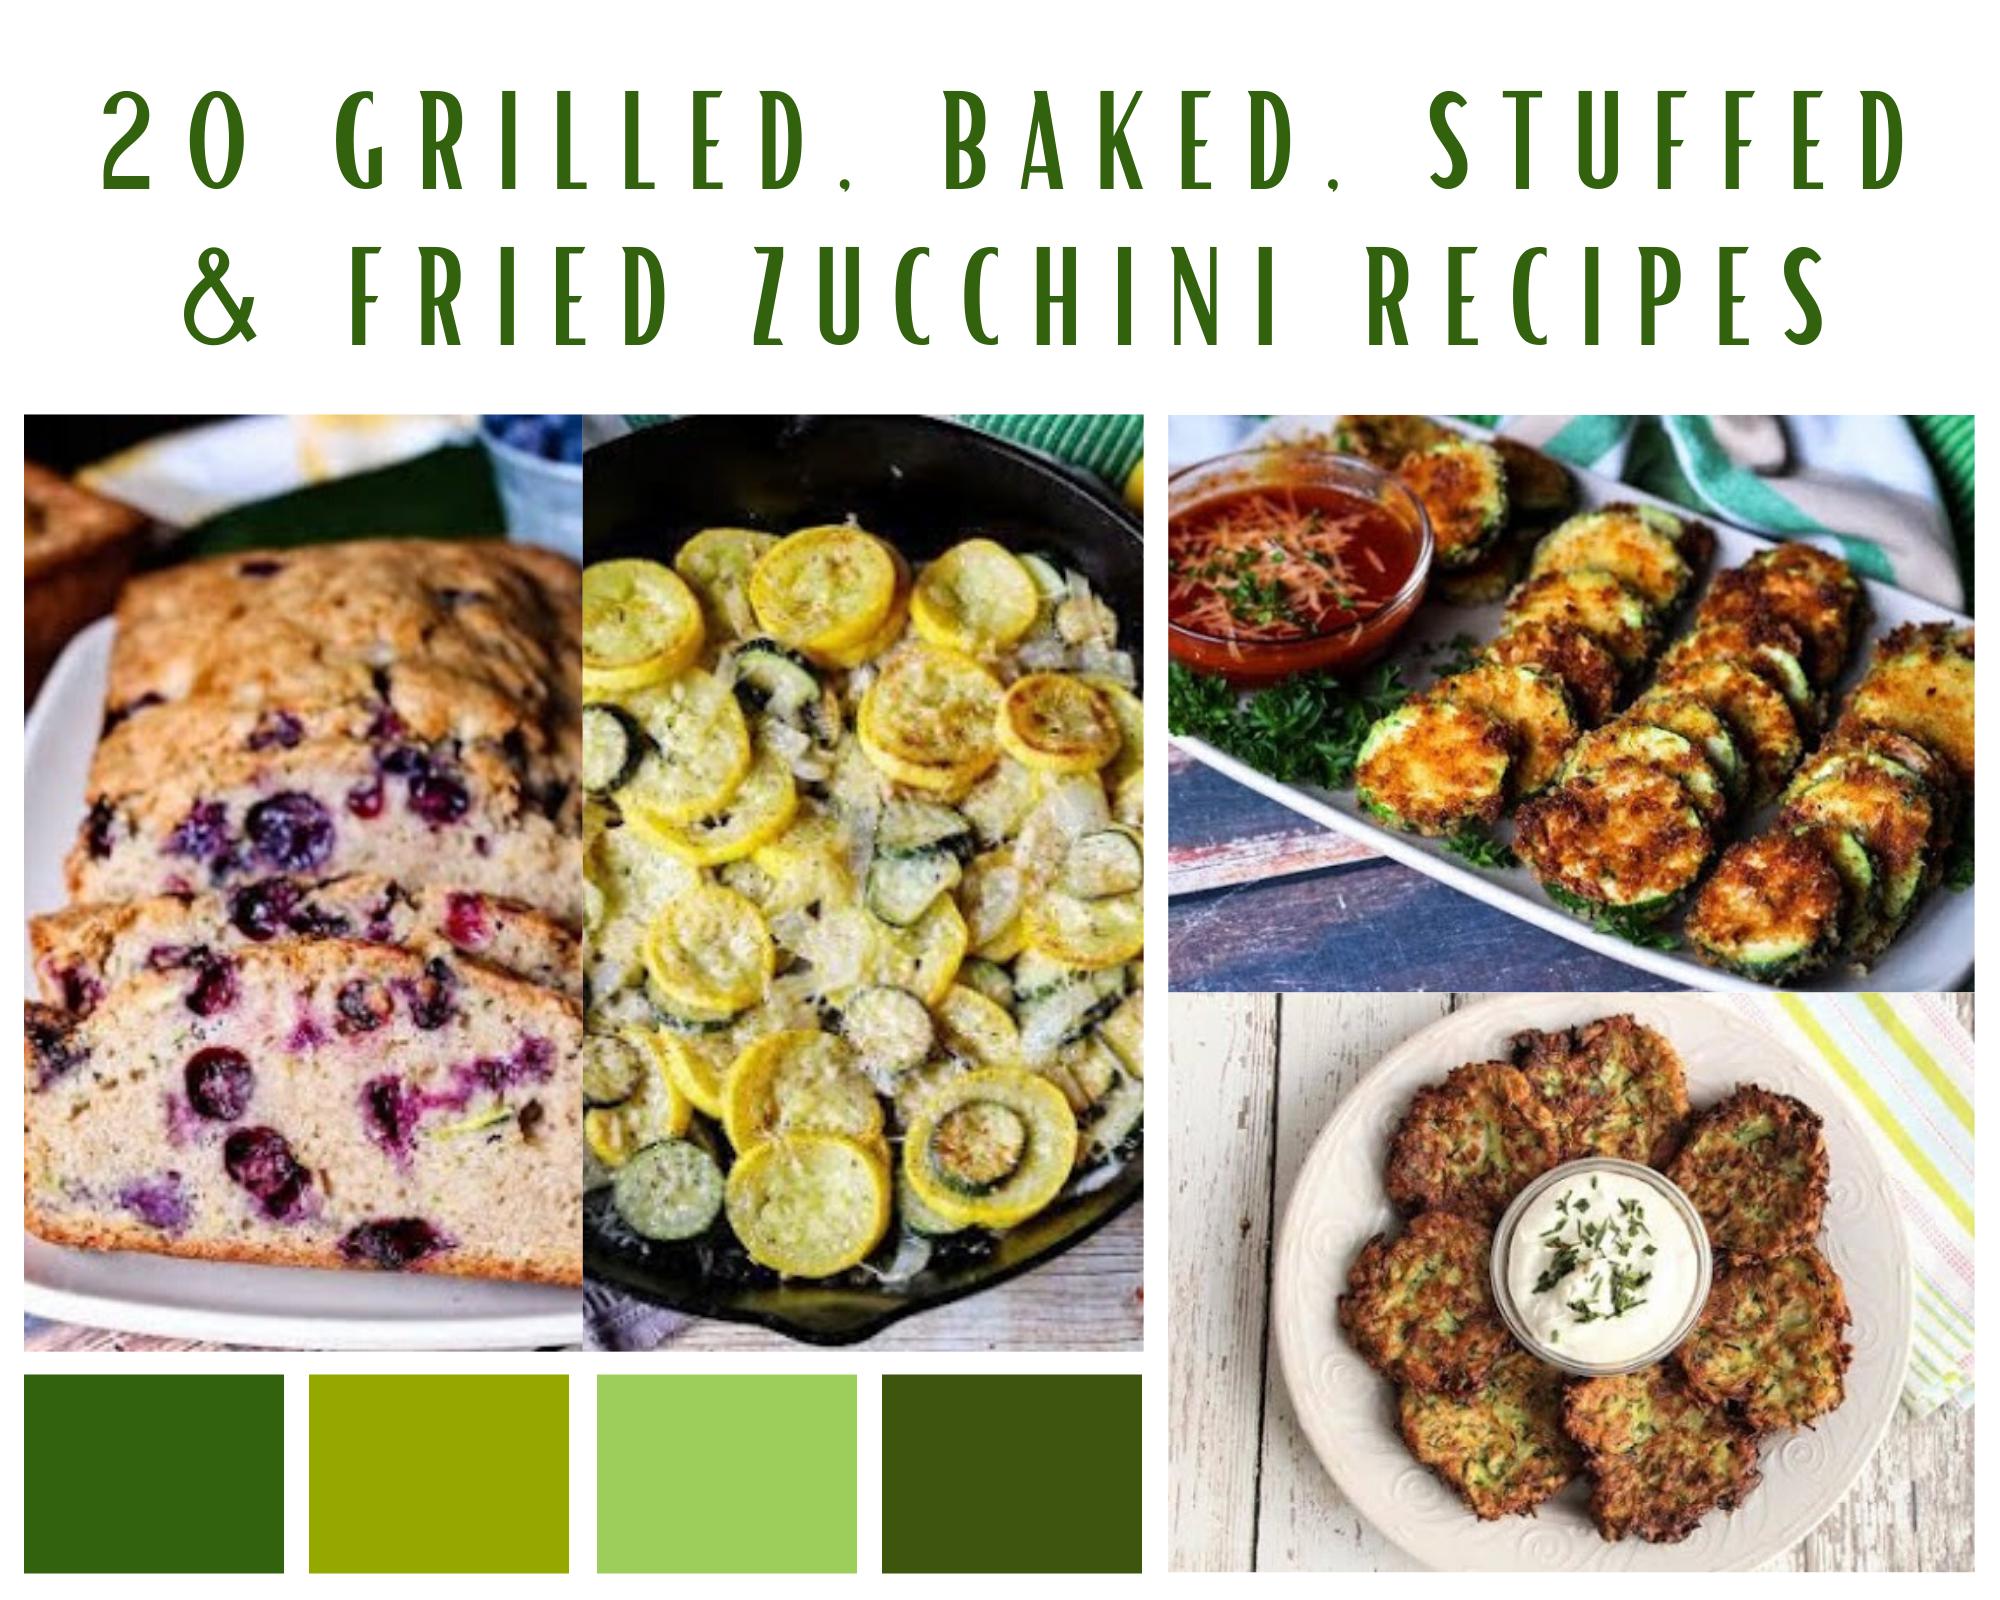 Zucchini bread, zucchini chips, zucchini fritters and sauteed zucchini